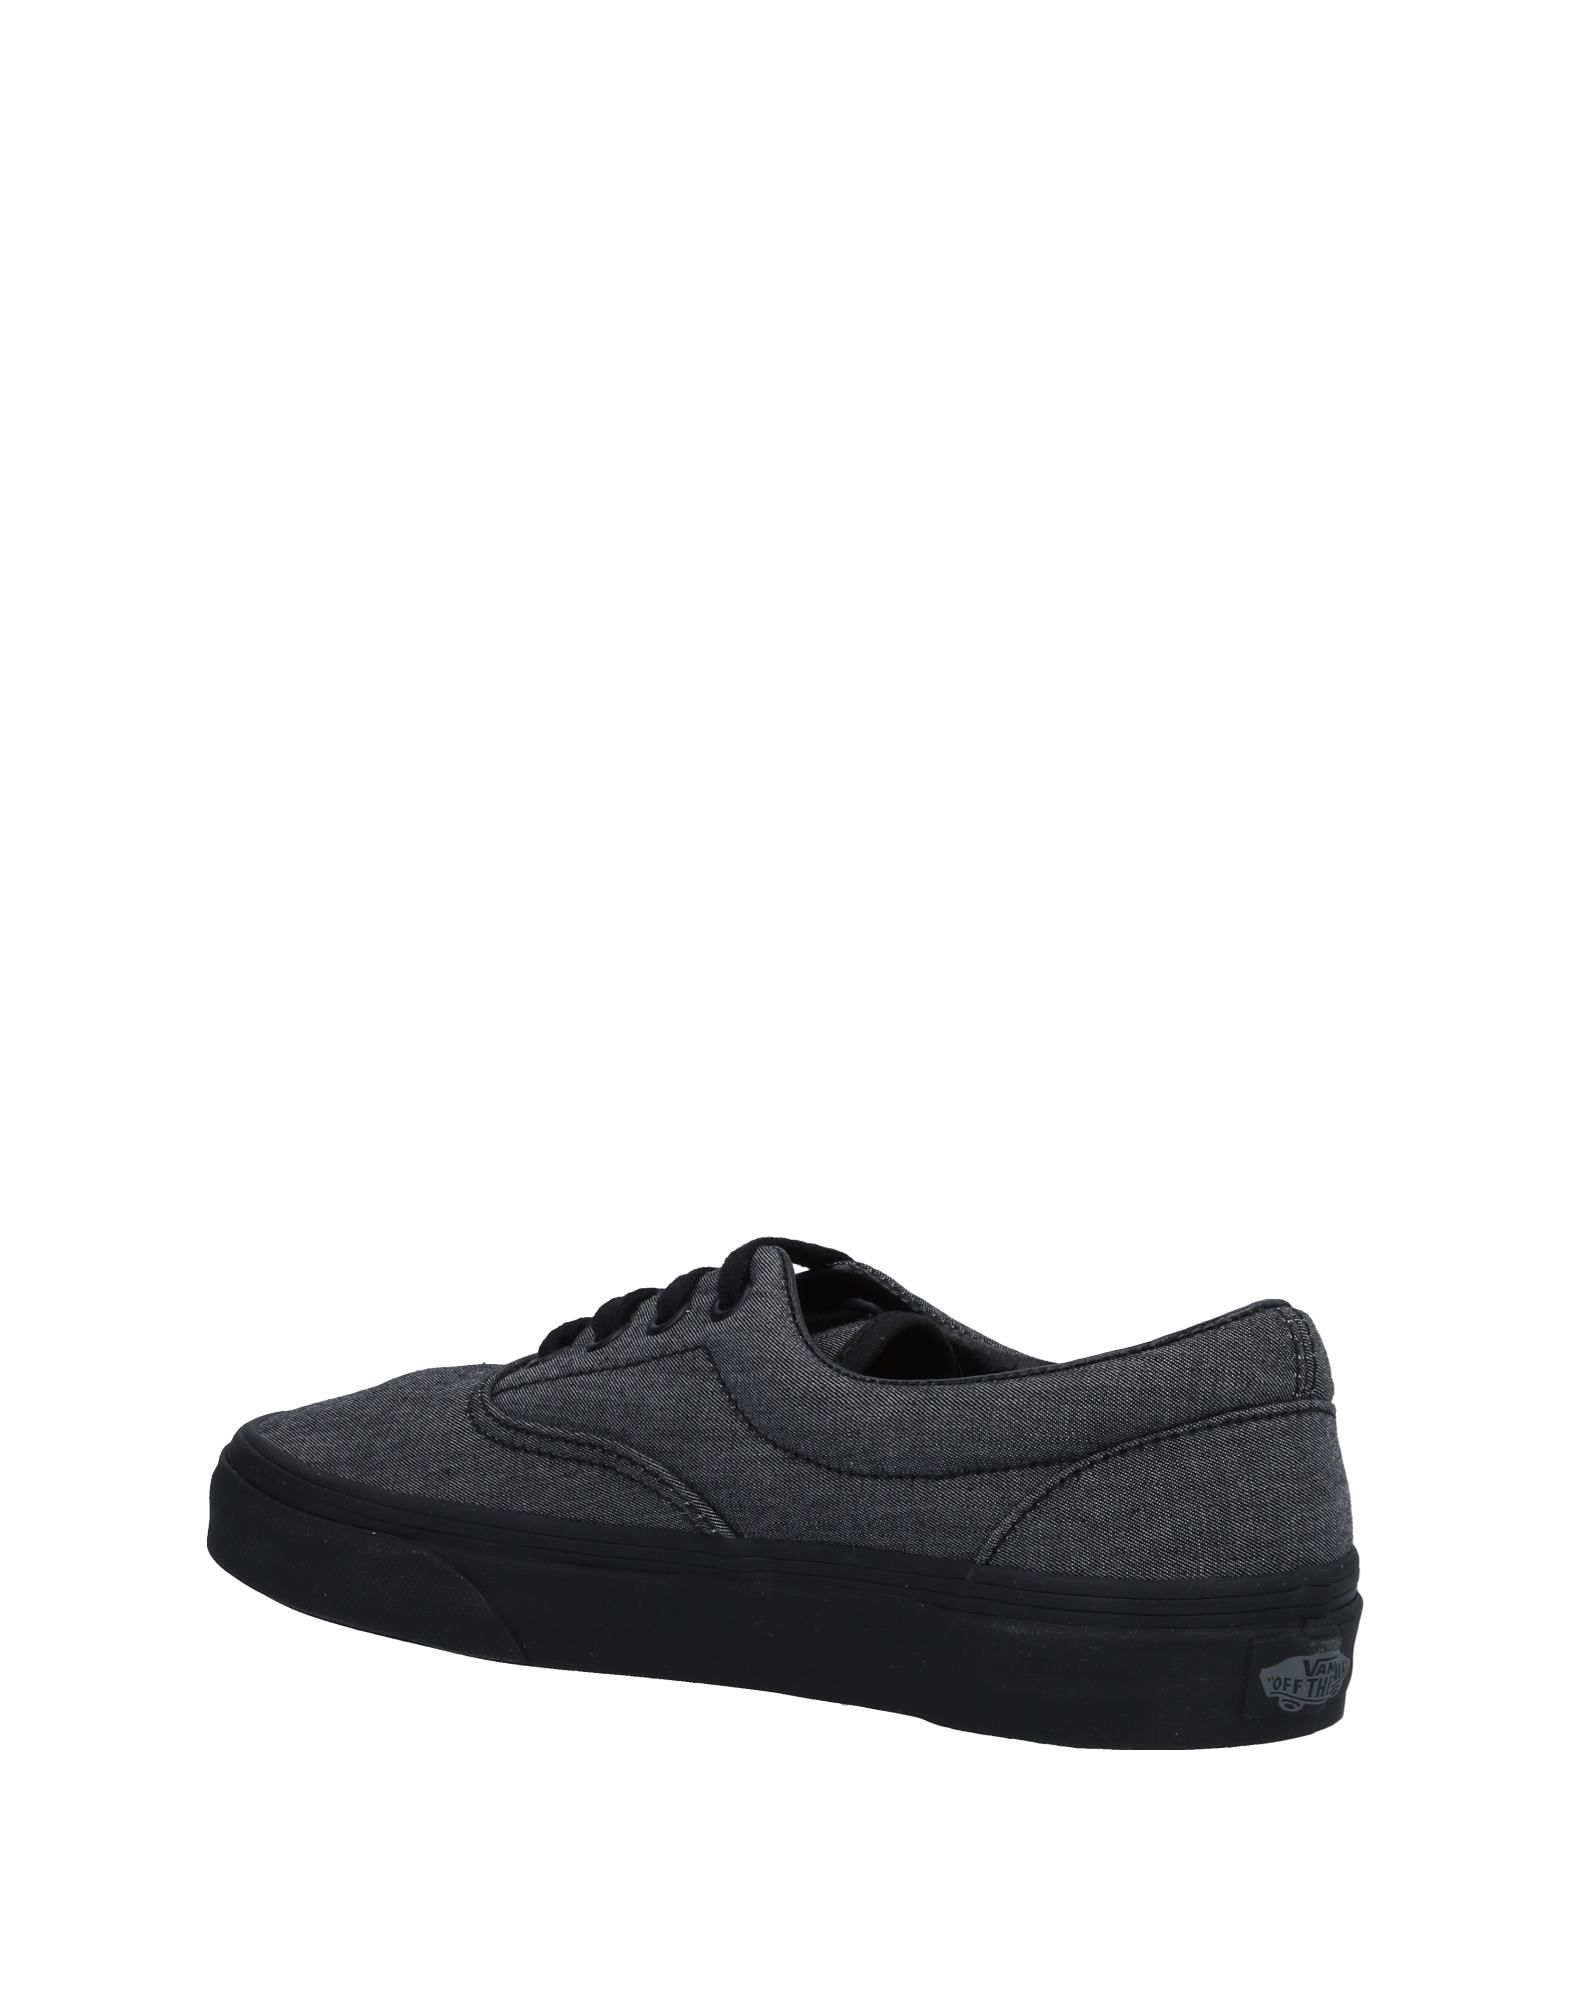 Vans Sneakers Damen  11495597WS Schuhe Gute Qualität beliebte Schuhe 11495597WS 266881